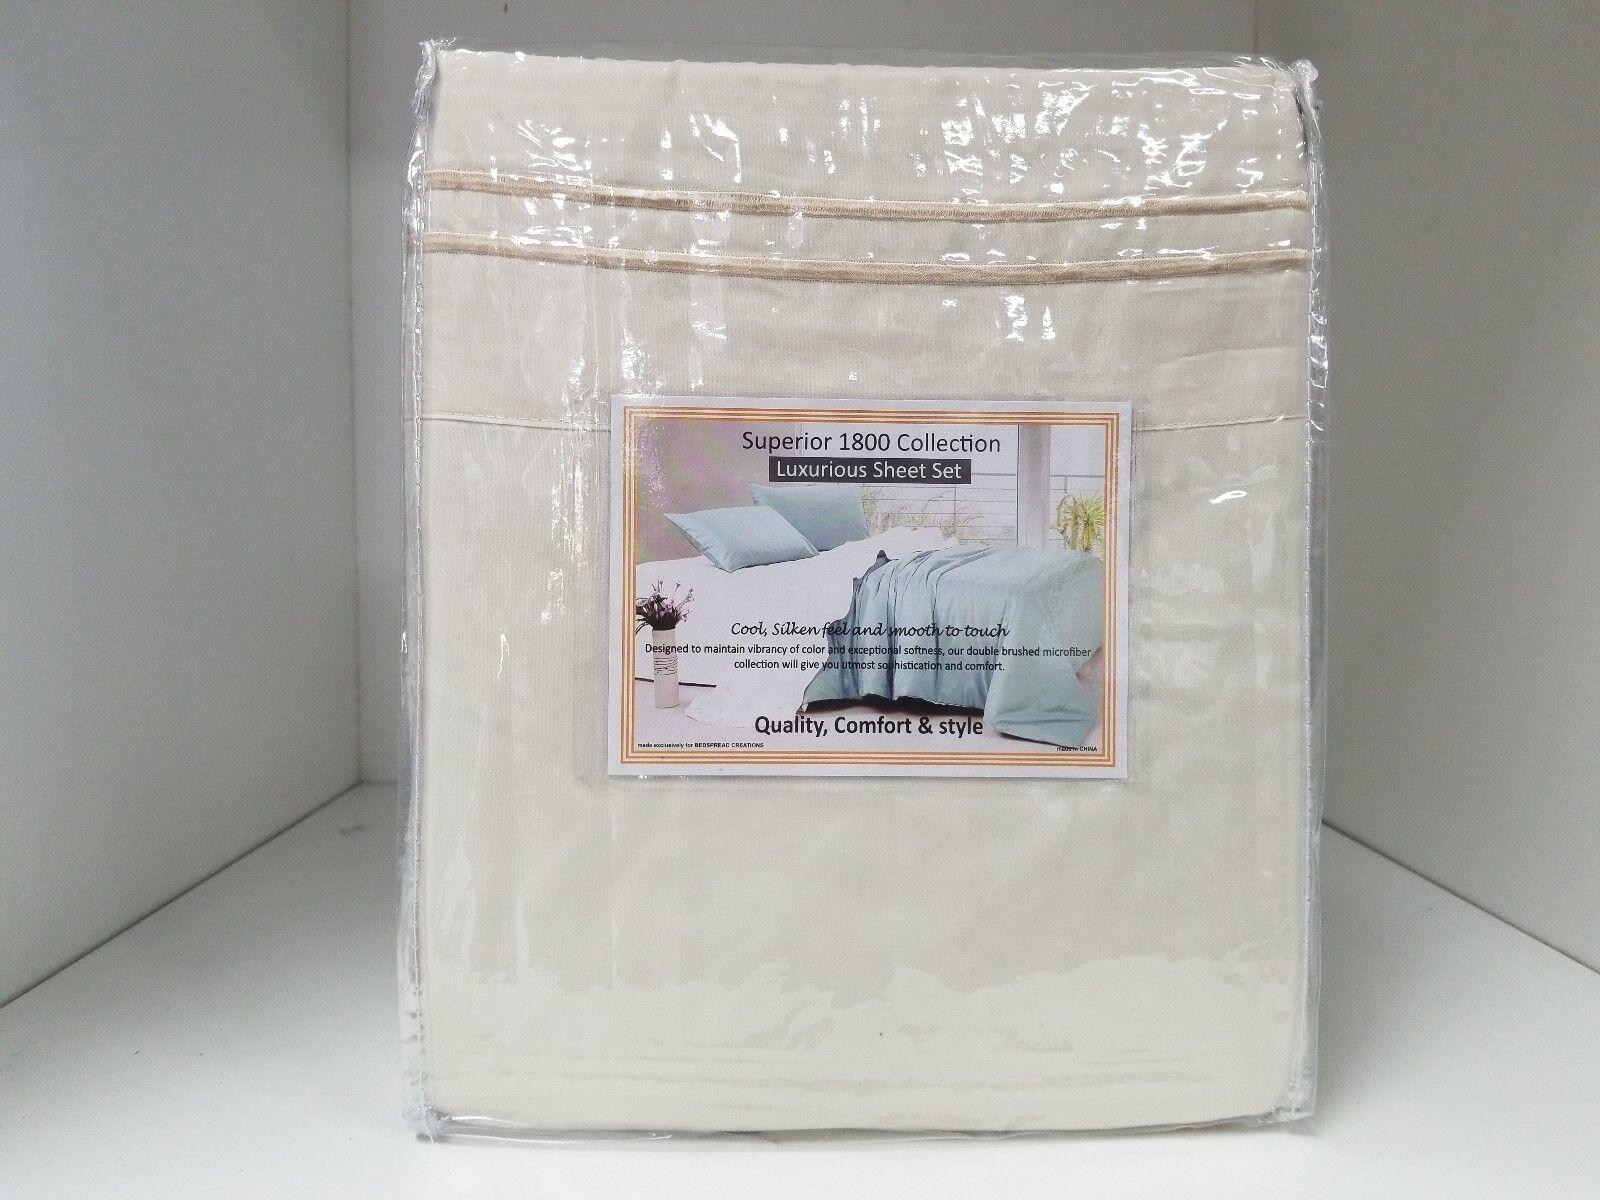 Microfiber Wood Frame Waterbed Sheet Set - Super Single 4 pillowcases - IVORY